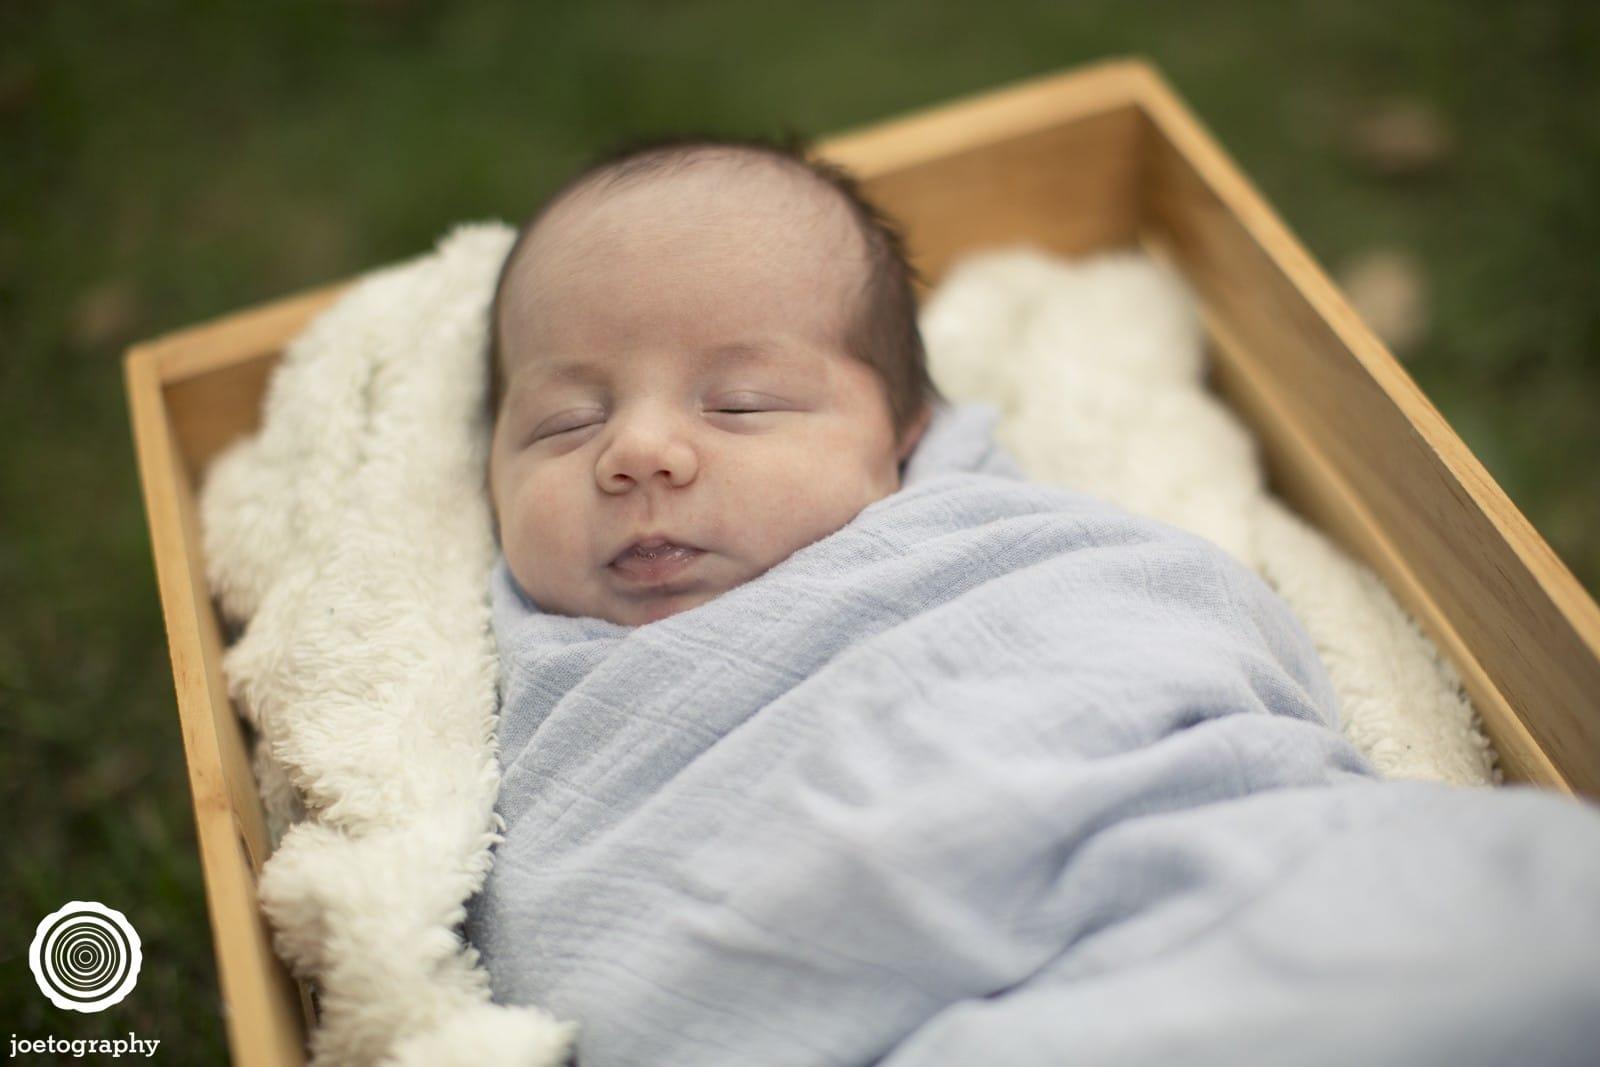 indianapolis-newborn-photography-leo-37